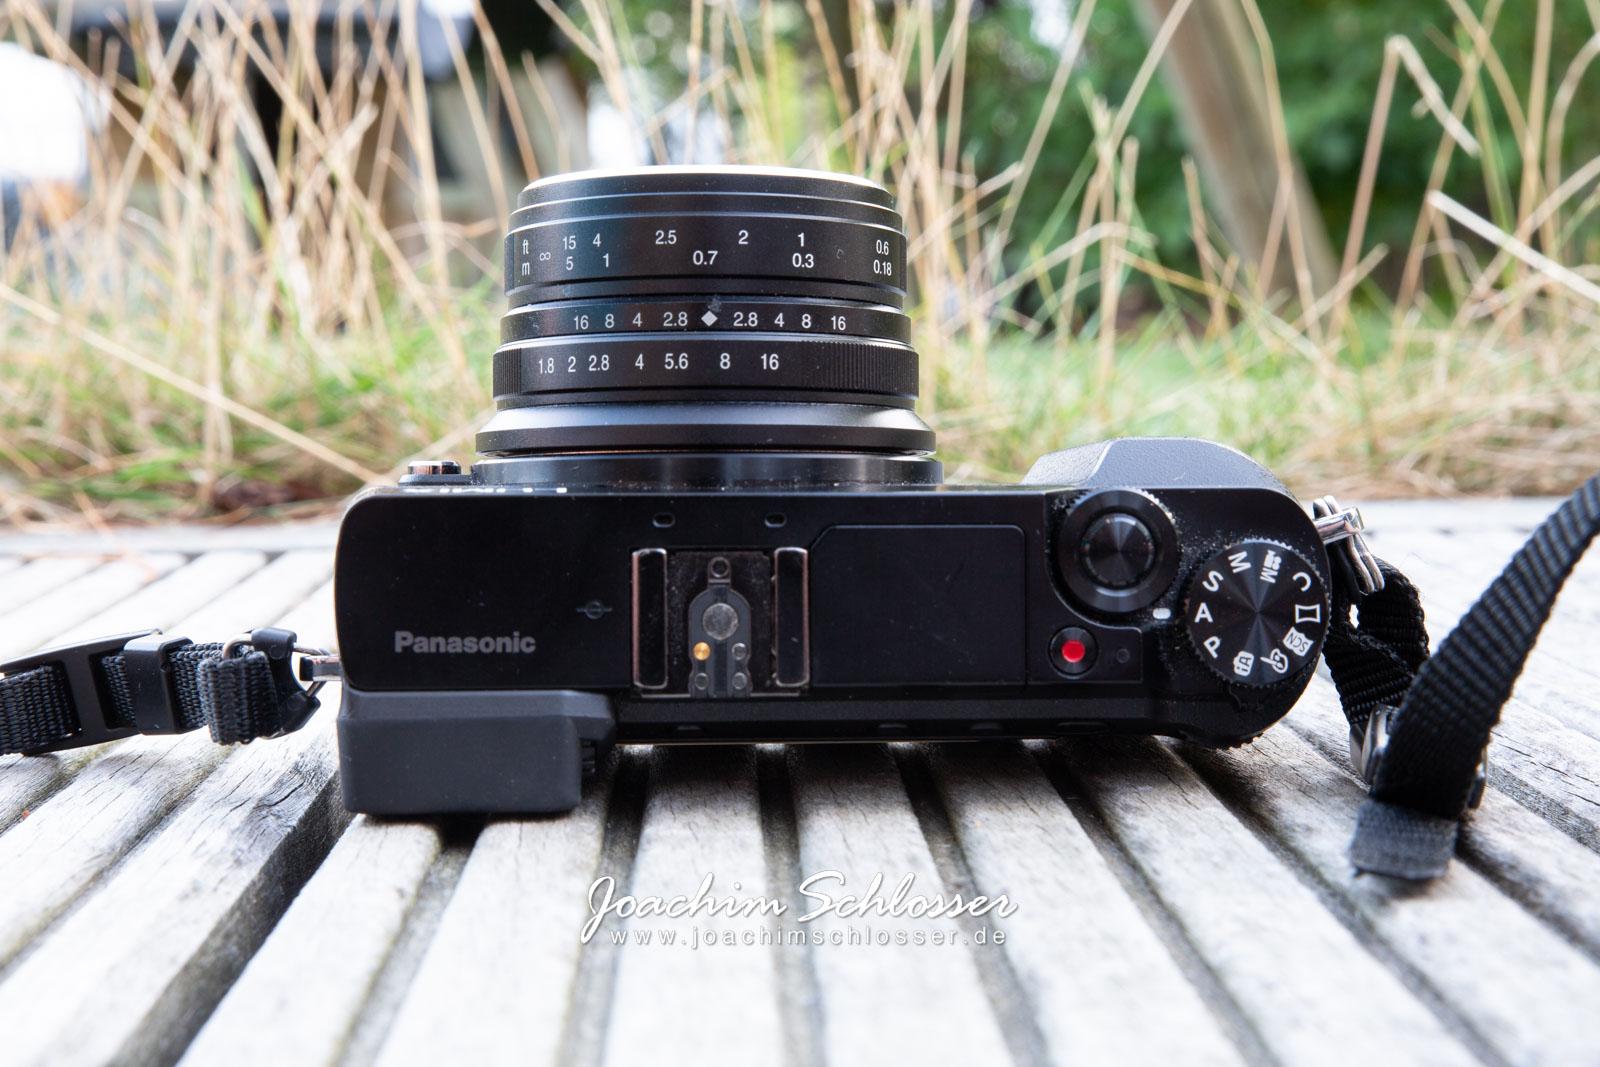 Kamera Panasonic Lumix GX80 mit 7artisans 25mm 1.8 oben